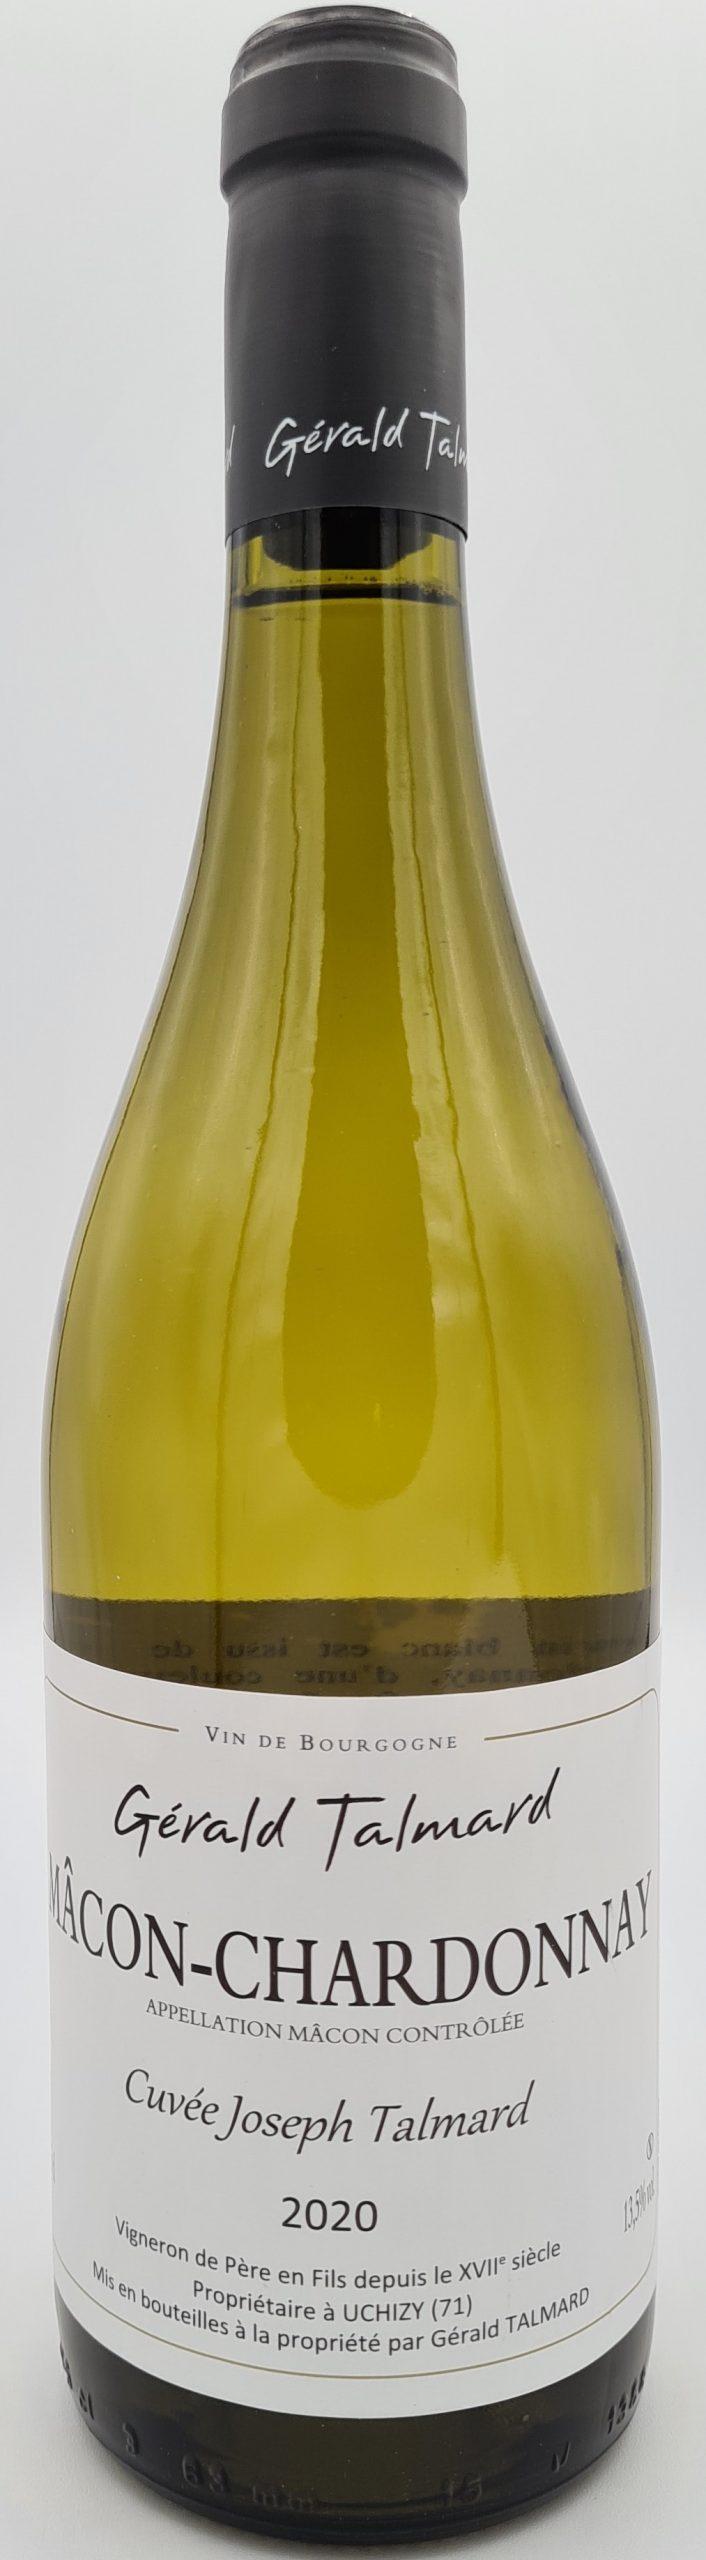 Vin de Bourgogne blanc et rouge